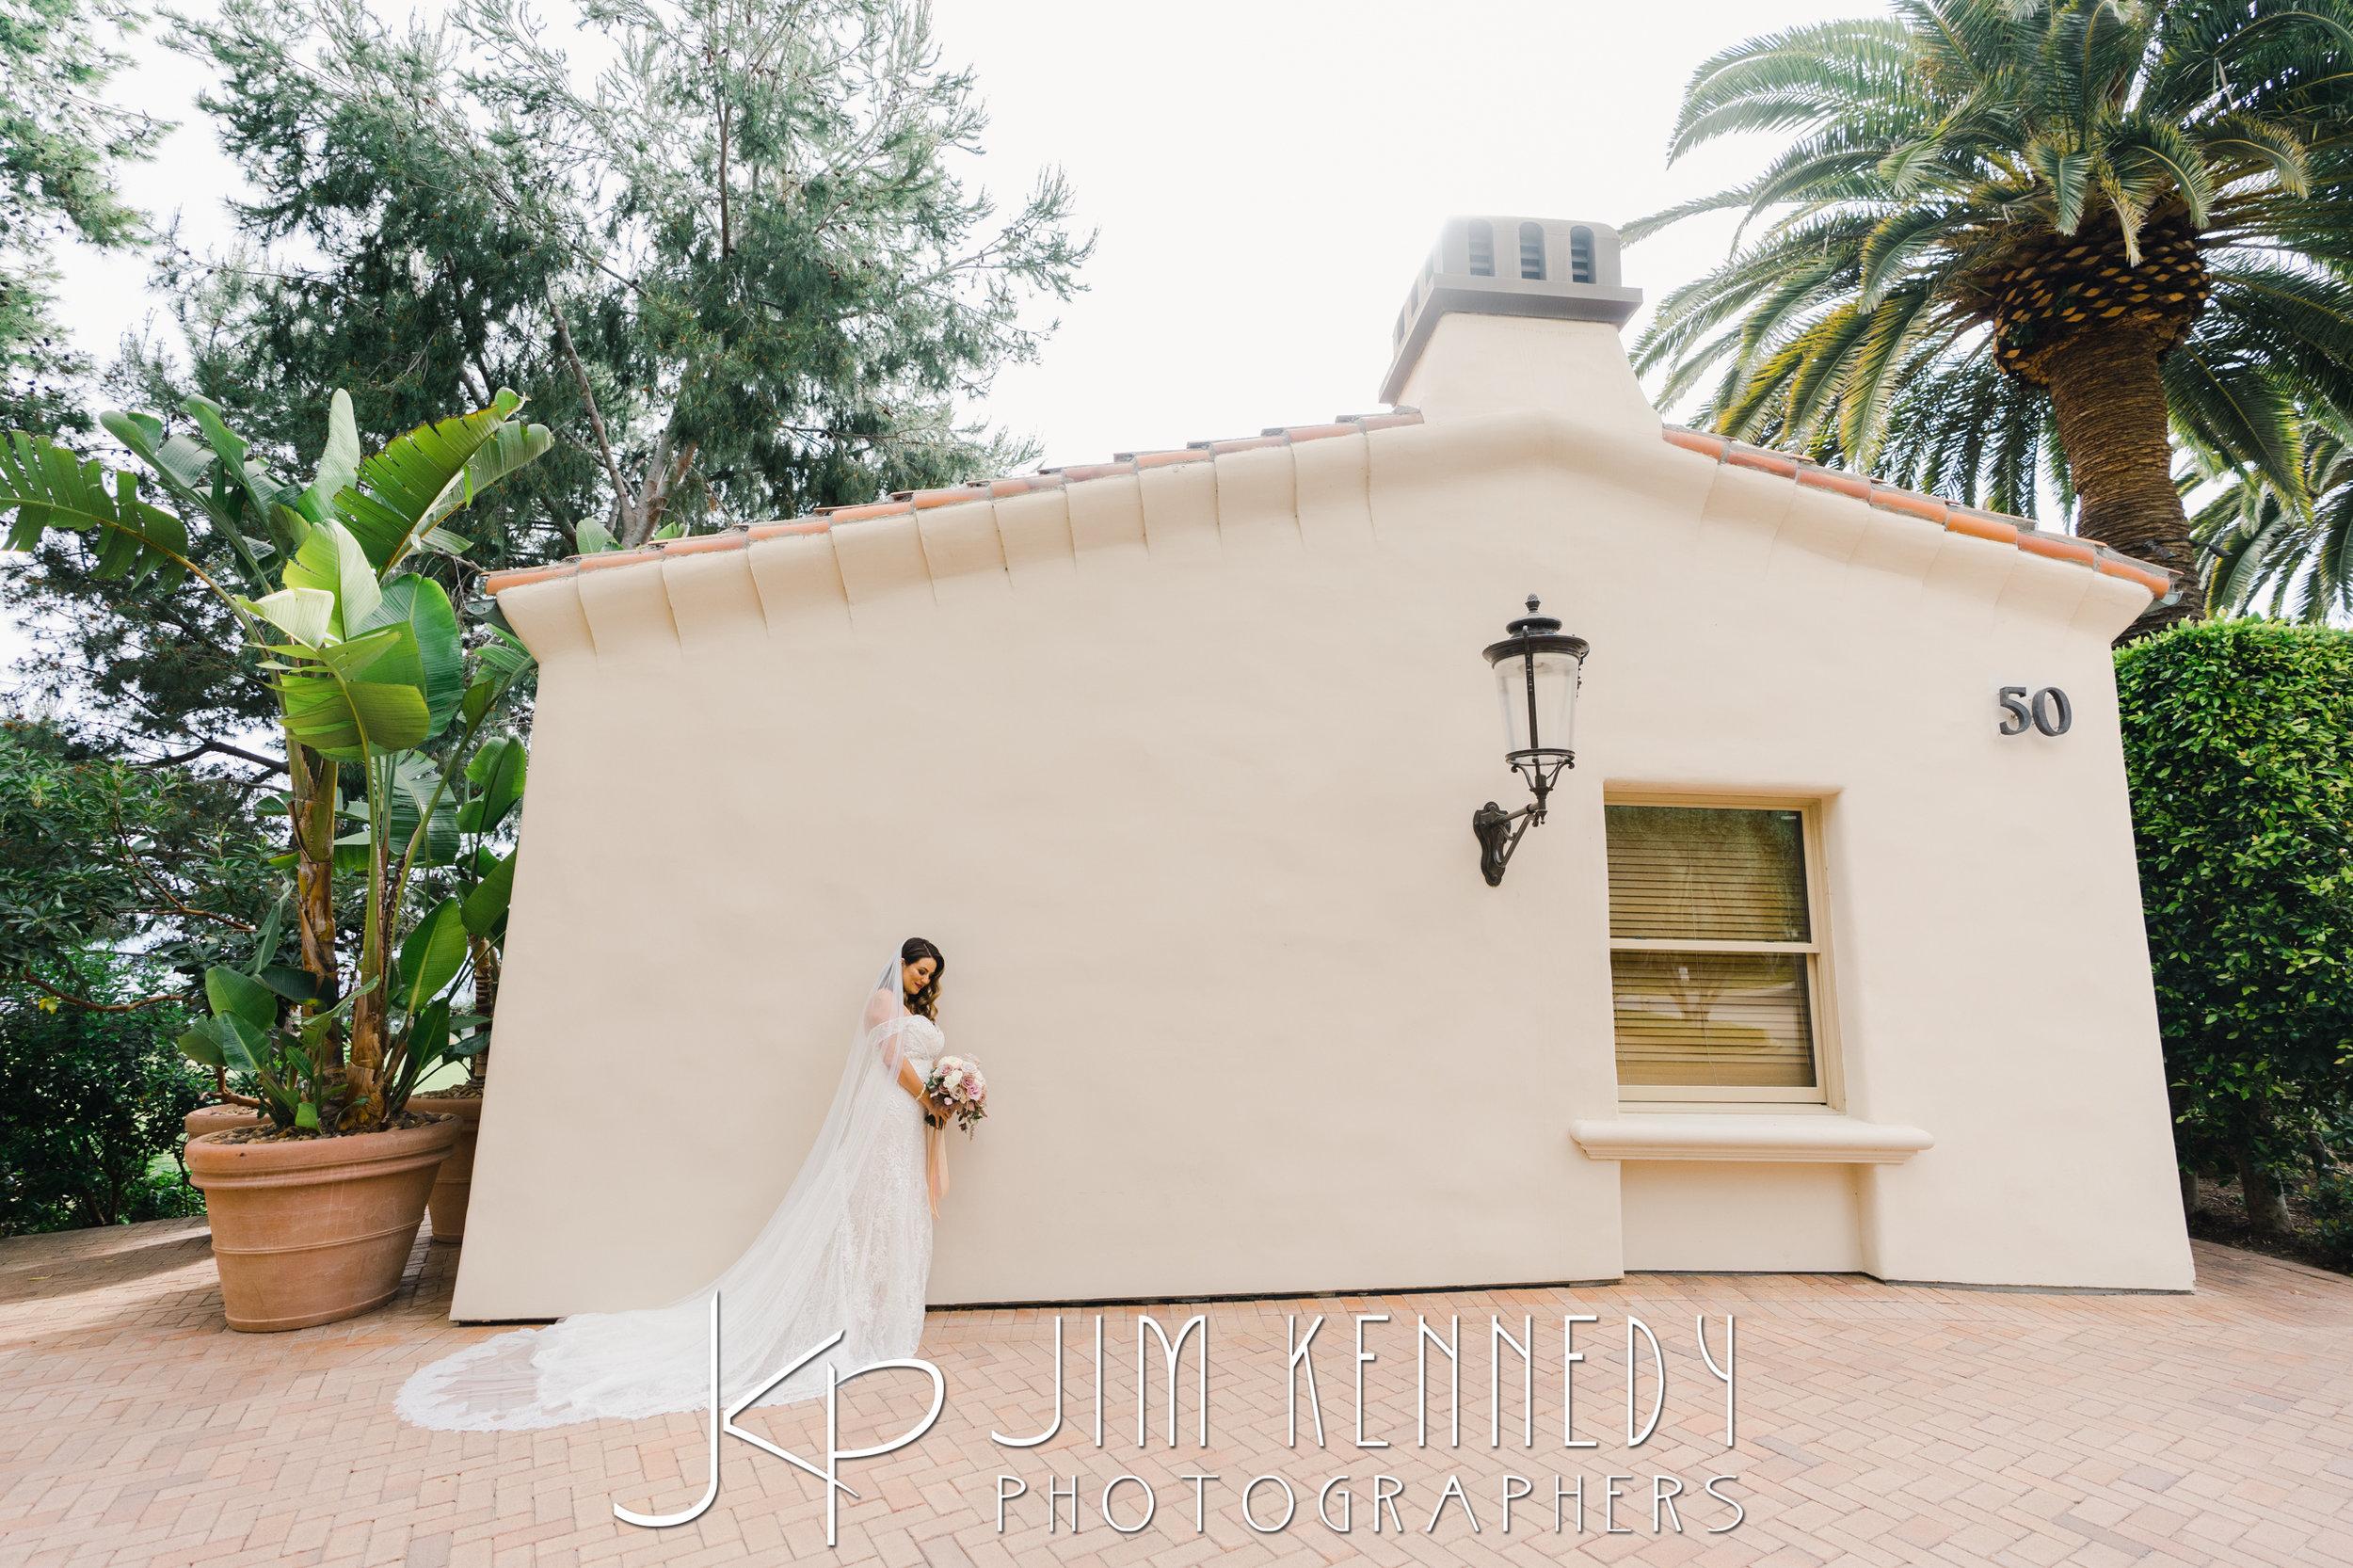 pelican-hill-wedding-jim-kenedy-photographers_0062.JPG